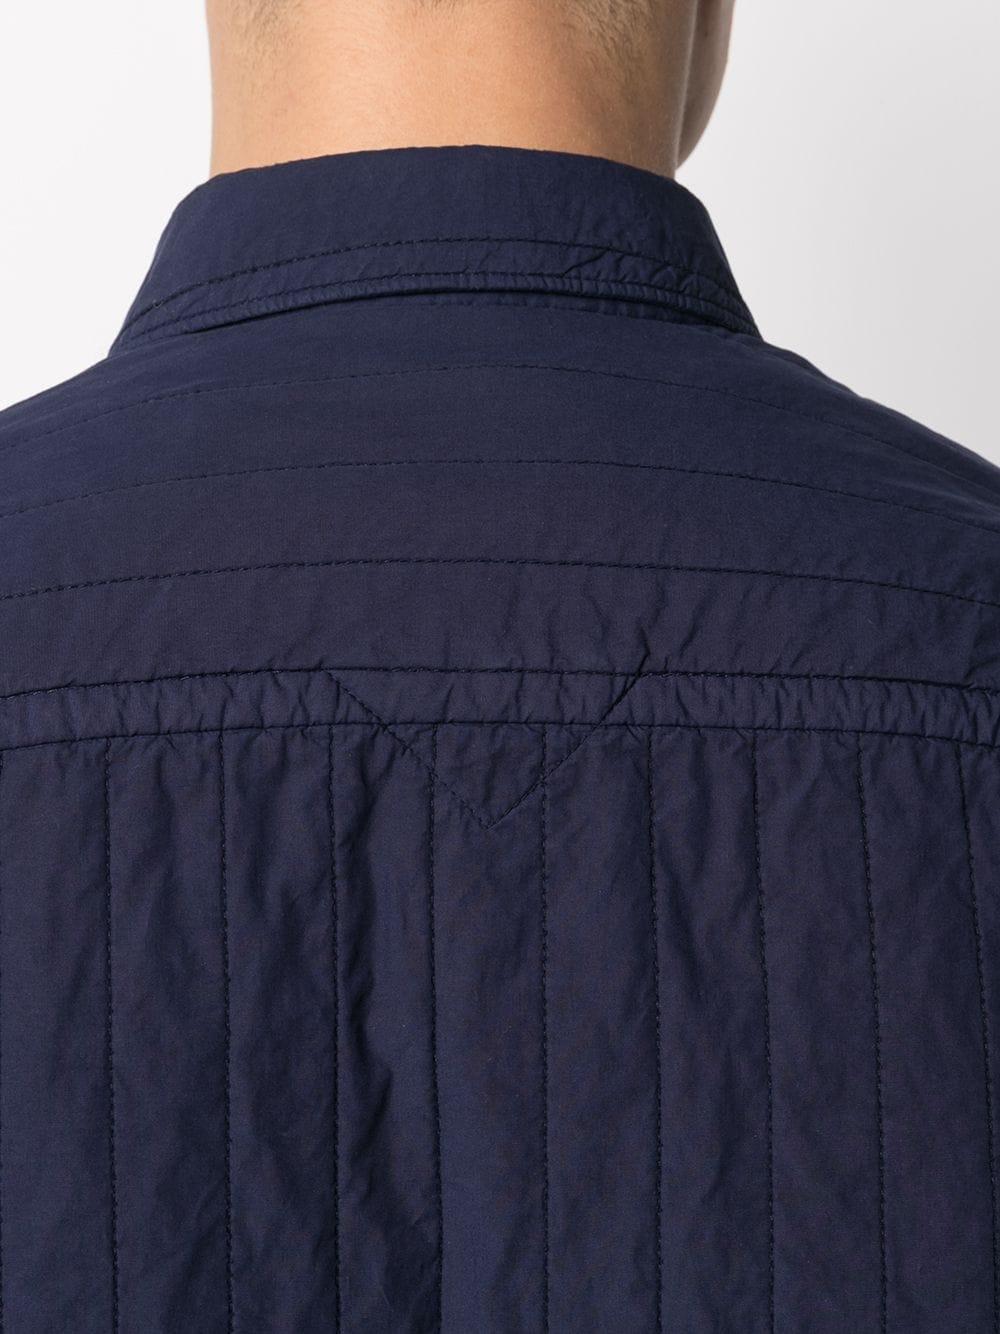 cheetah quilted shirt man blue KENZO   Shirts   FB55CH4101LA76